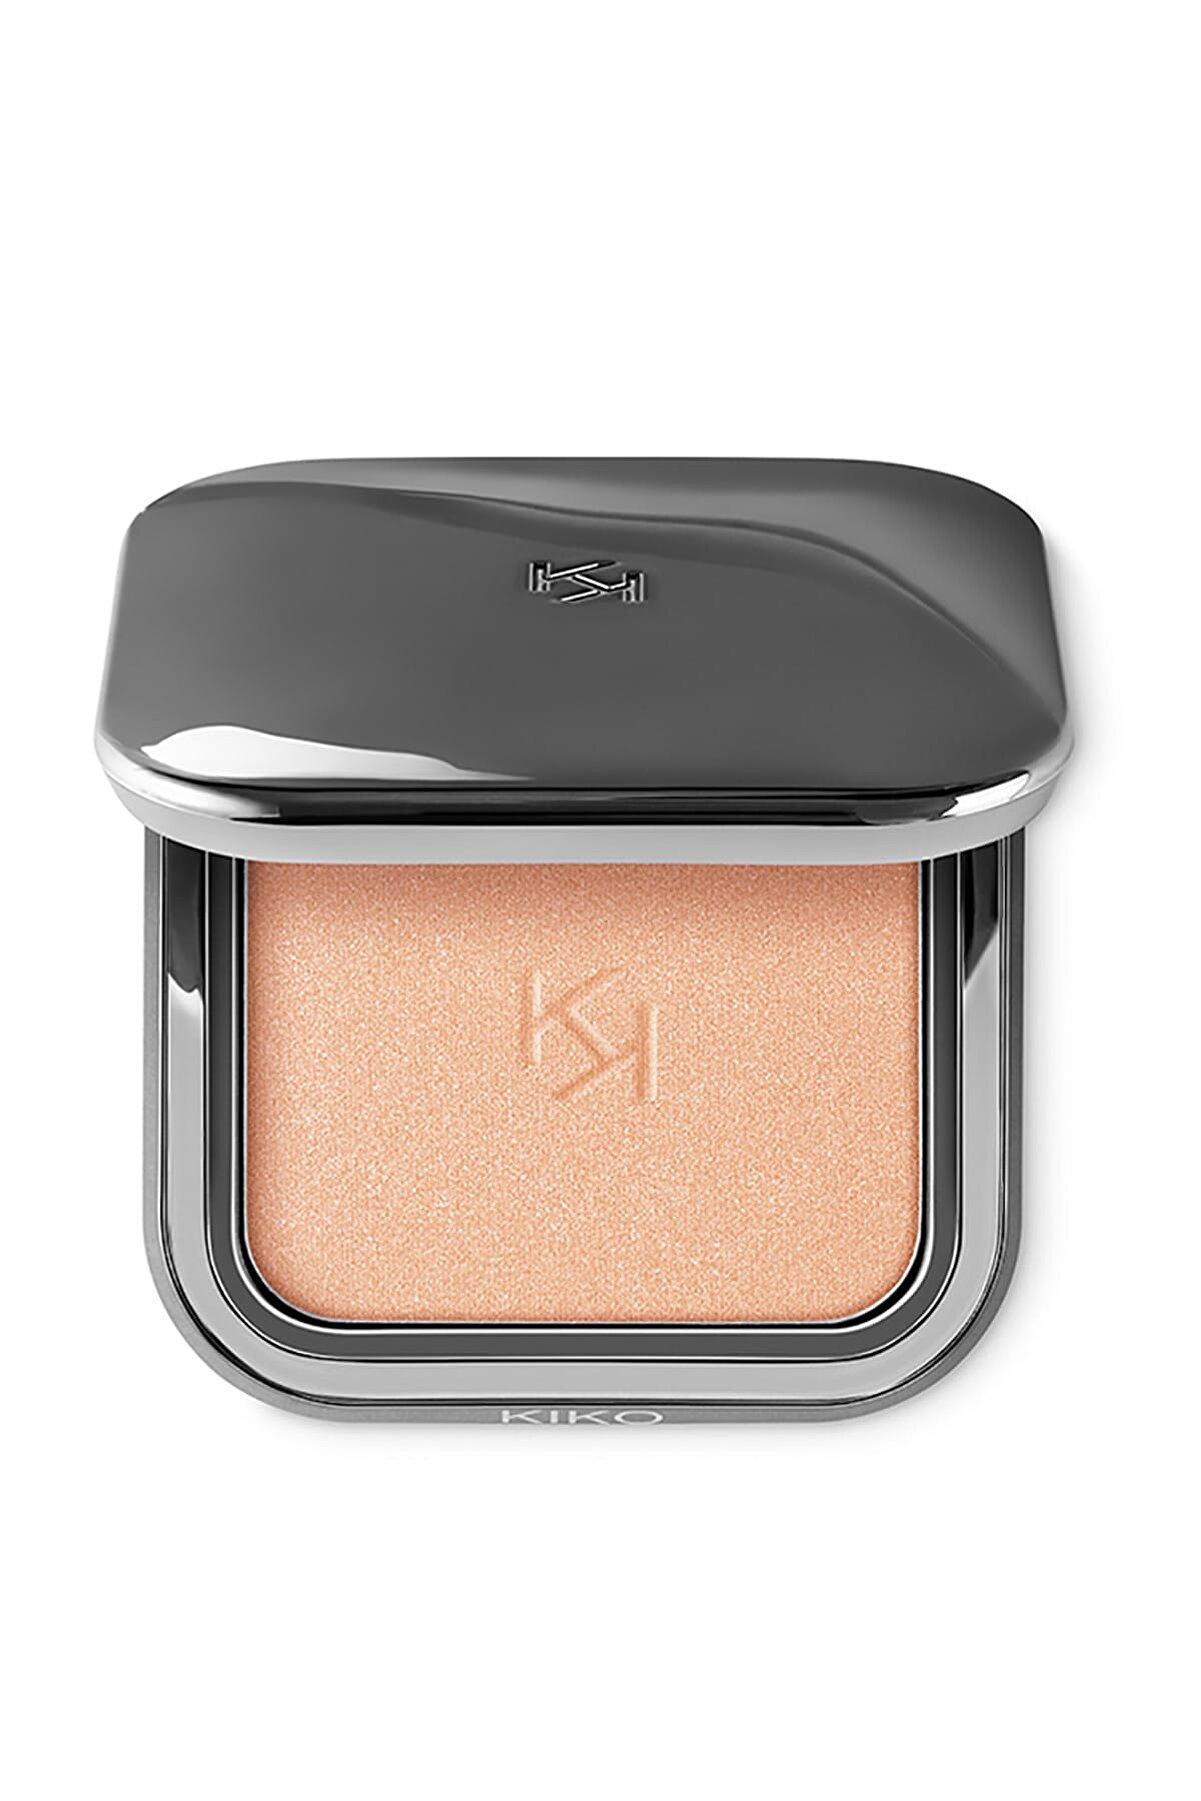 KIKO Aydınlatıcı Pudra - Glow Fusion Powder Highlighter 02 Heavenly Gold 8025272633192